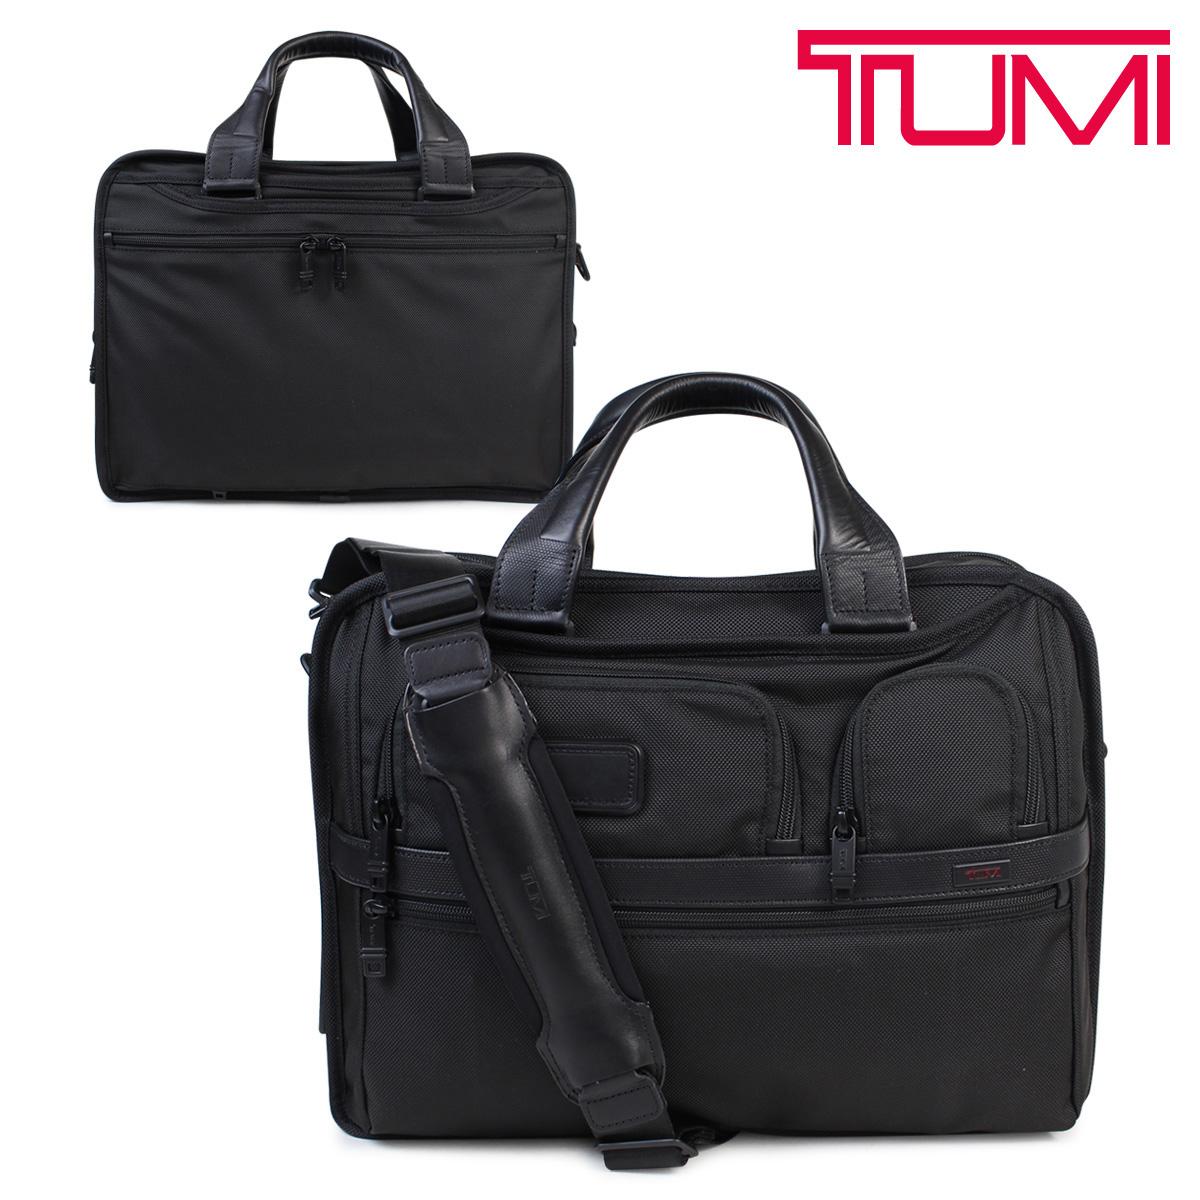 TUMI EXPANDABLE ORGANIZER COMPUTER BRIEF トゥミ ビジネス バッグ メンズ 026141D2 ALPHA2 ブリーフケース [185]